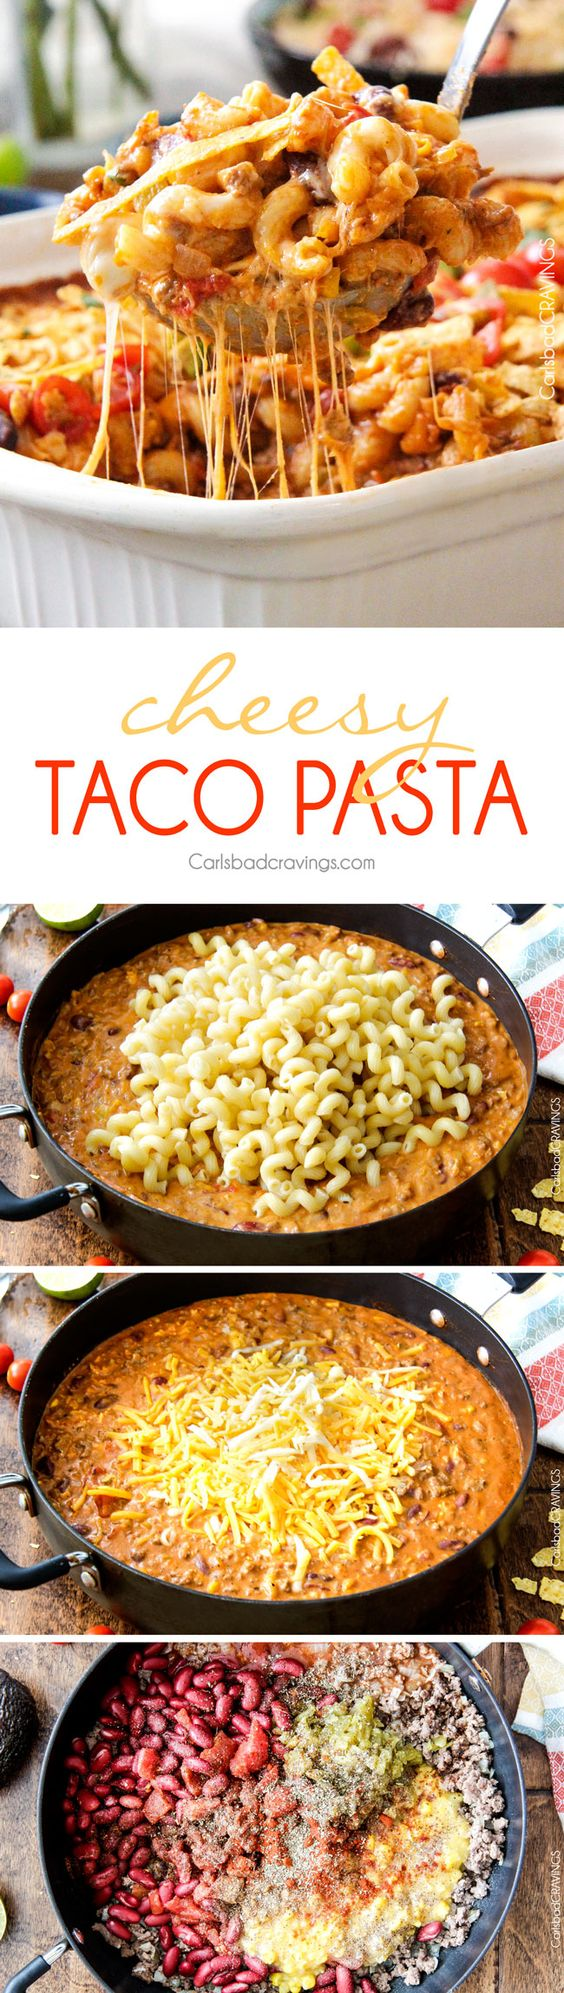 Taco Pasta Bake | Recipe | Tacos, Pasta and Creamy Sauce